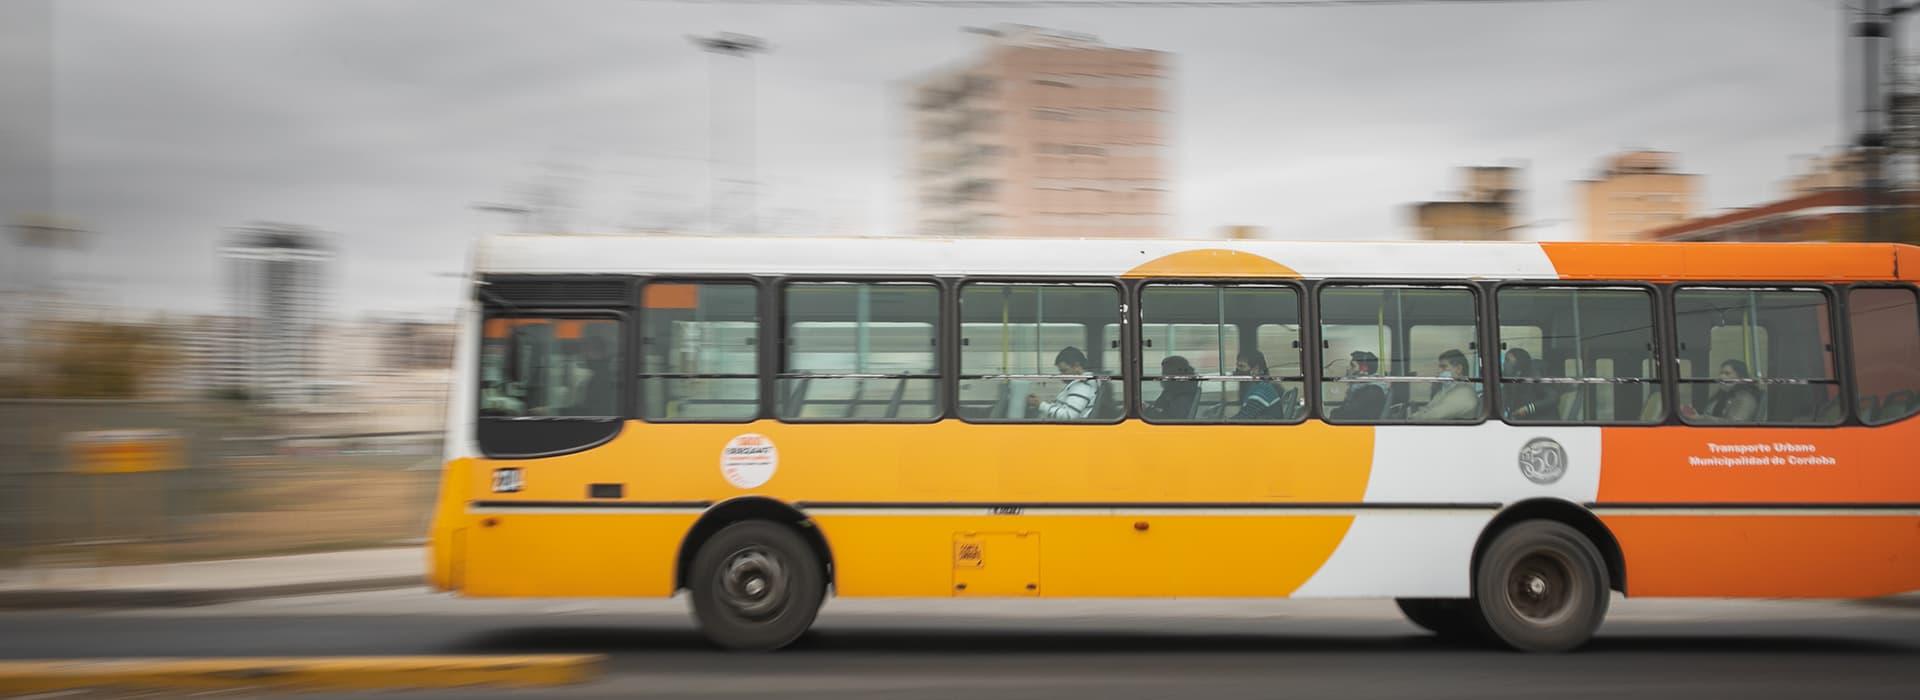 Imagen | Transporte público, transporte activo e intermodalidad